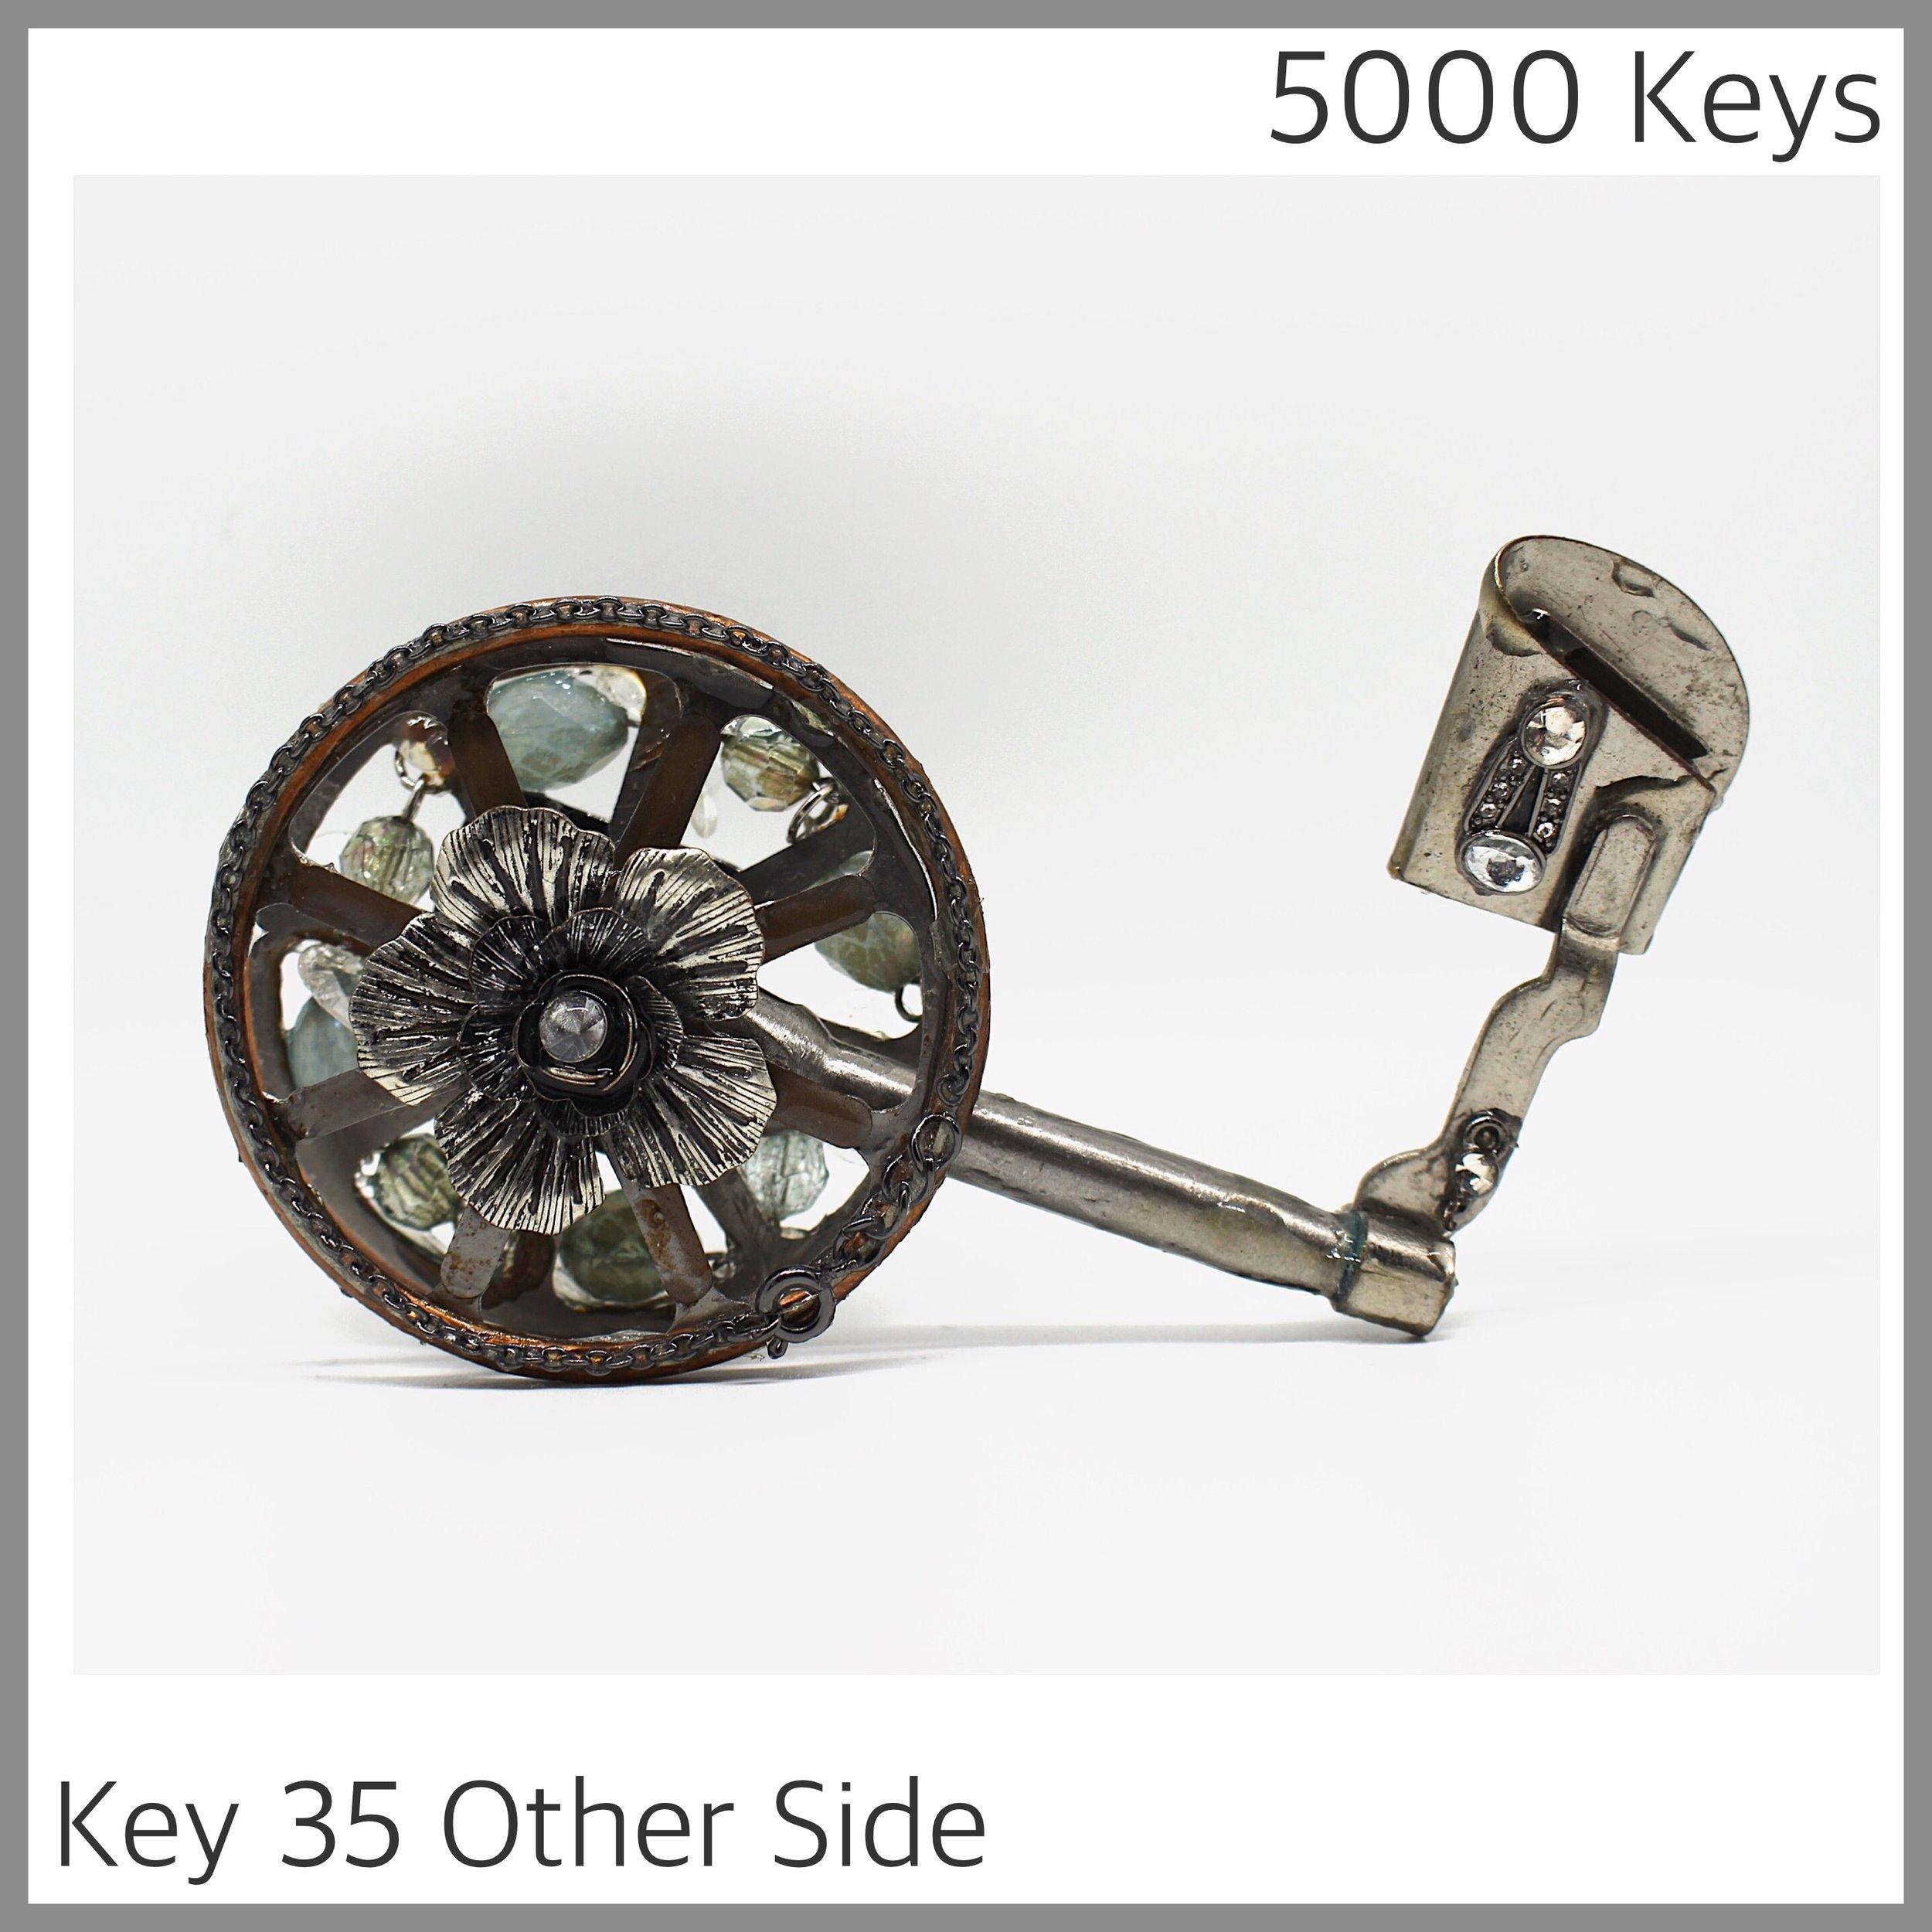 Key 35 other side.JPG